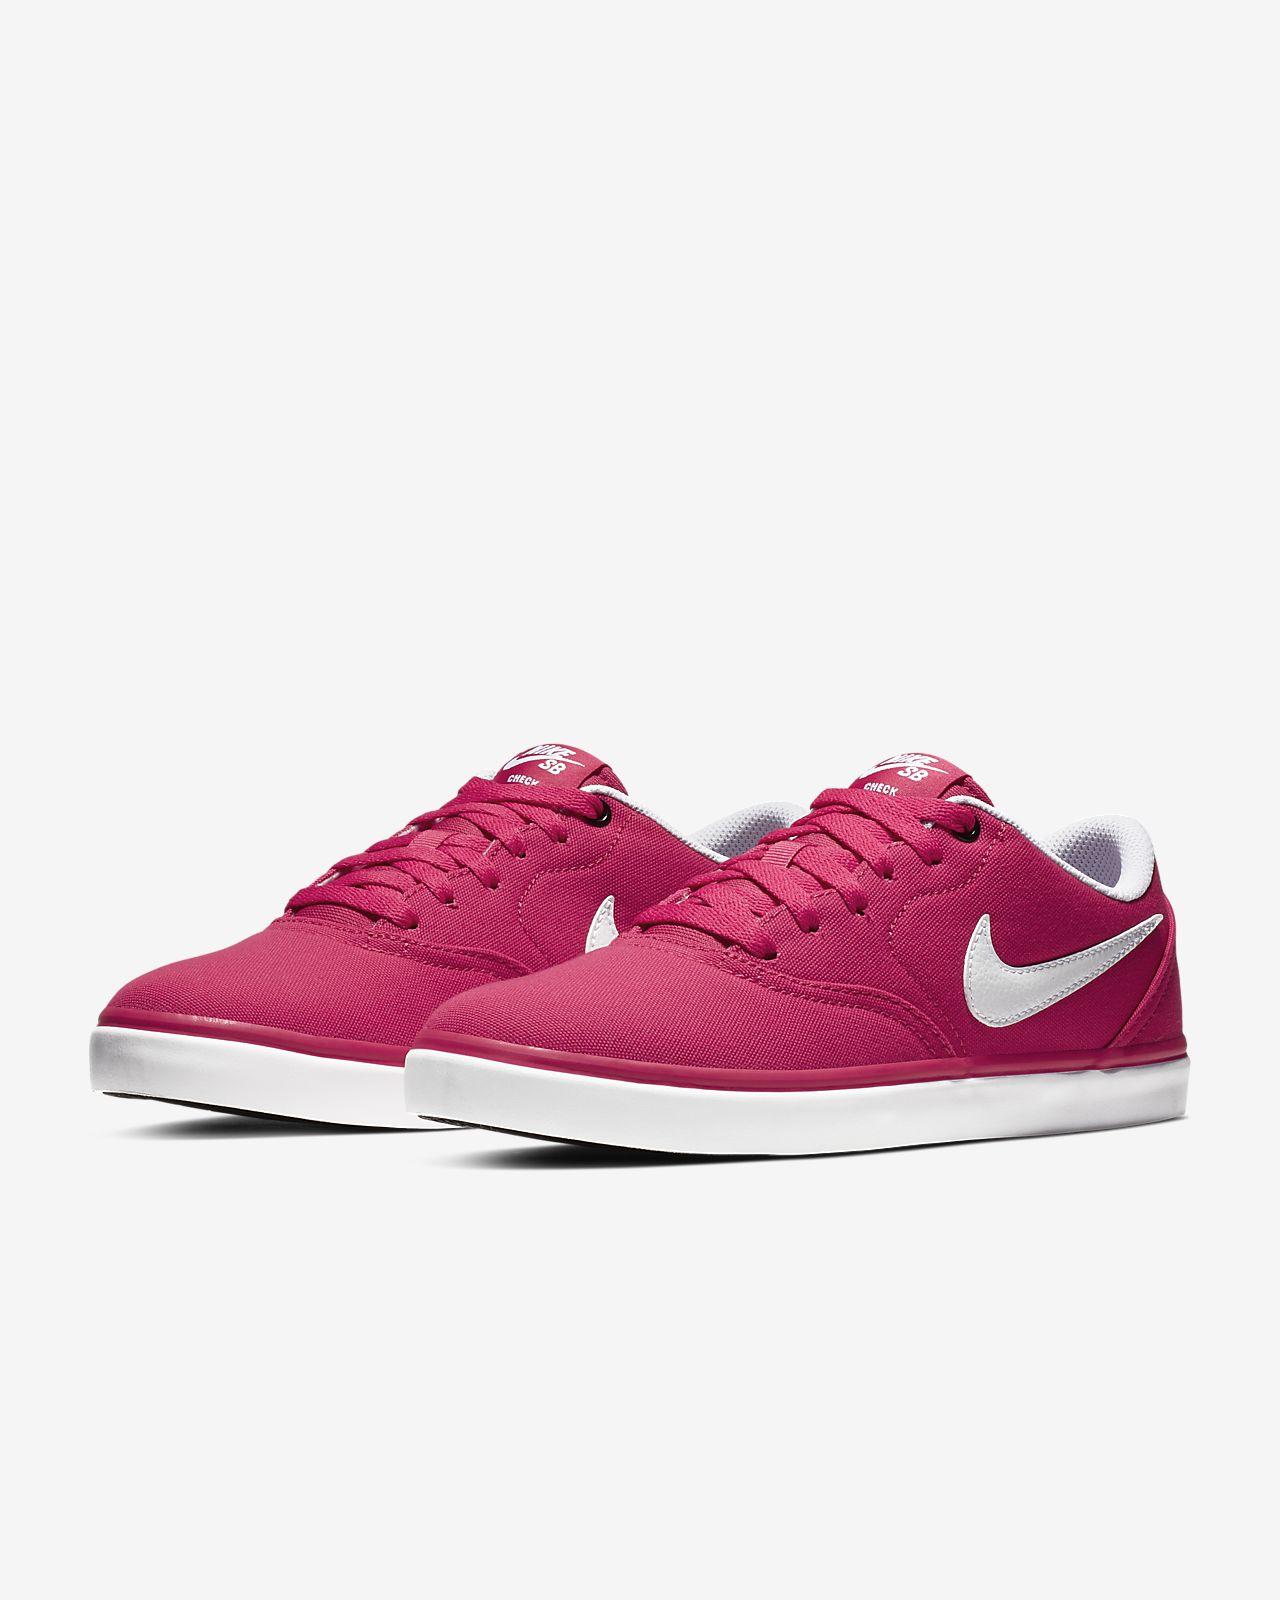 9c2356445852f Calzado de skateboarding para mujer Nike SB Check Solarsoft Canvas ...